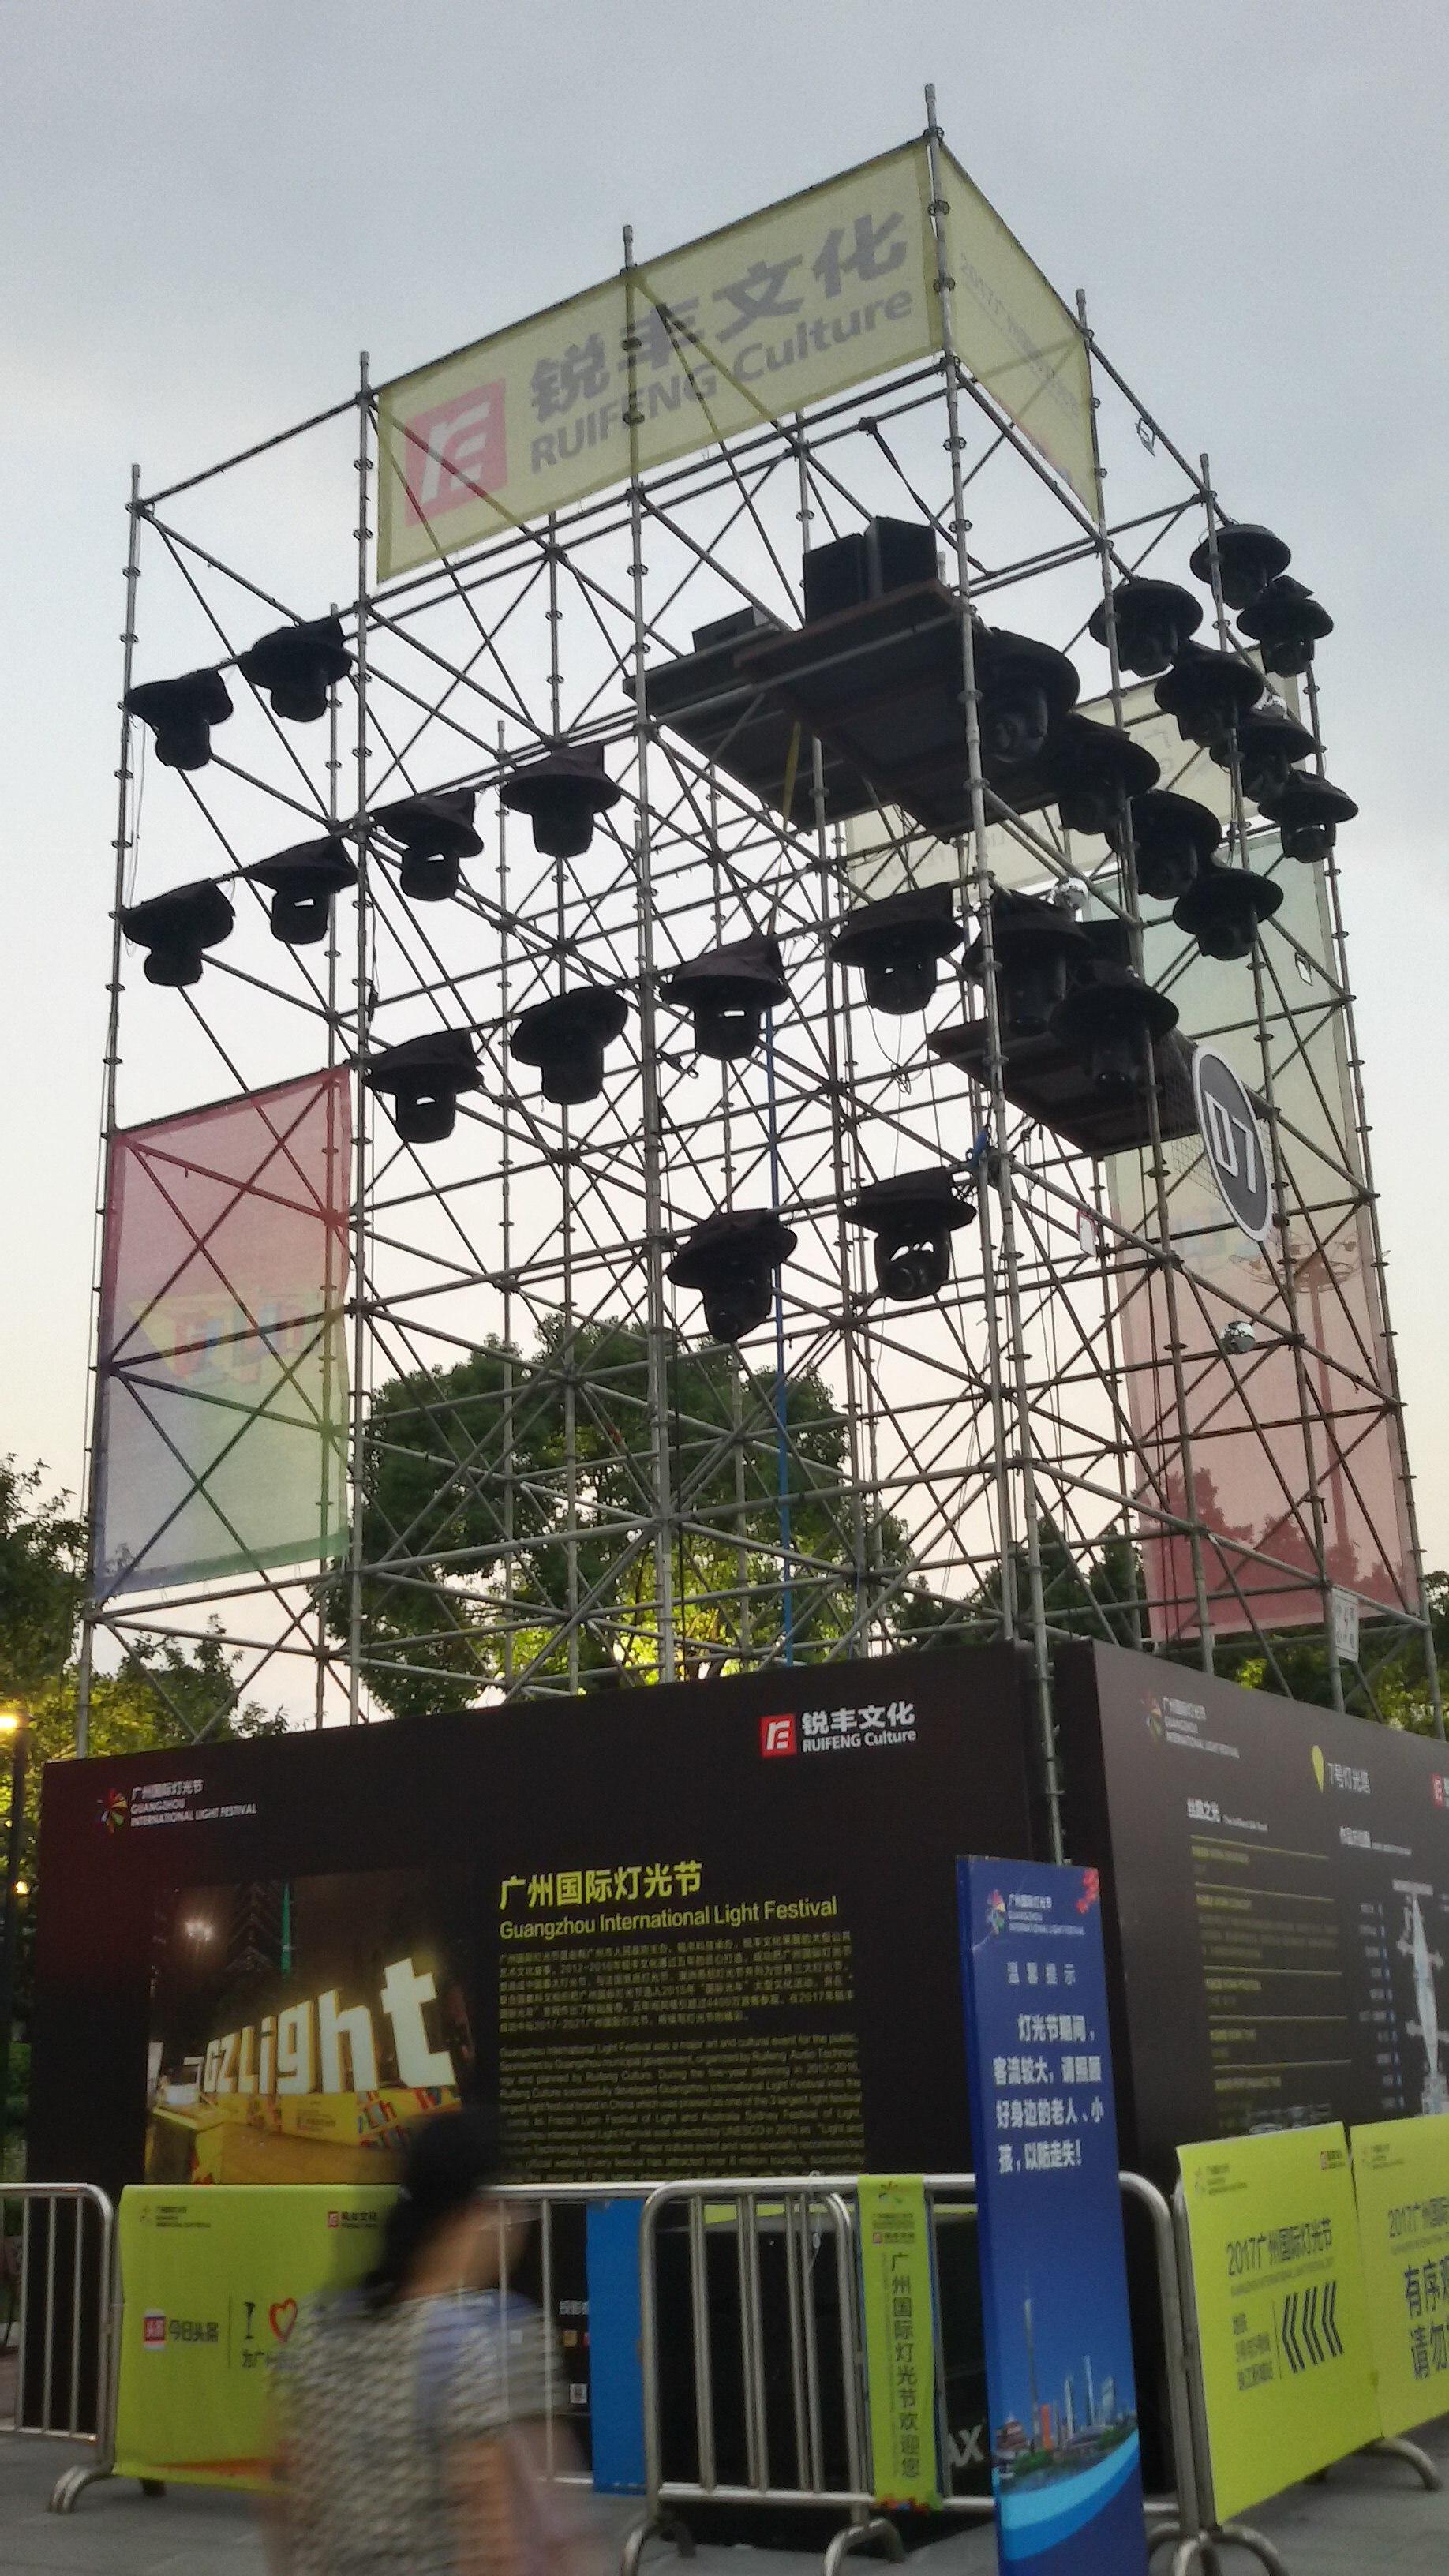 FileLighting Tower 7 for the 7th. Guangzhou International Light Festival.jpg & File:Lighting Tower 7 for the 7th. Guangzhou International Light ...